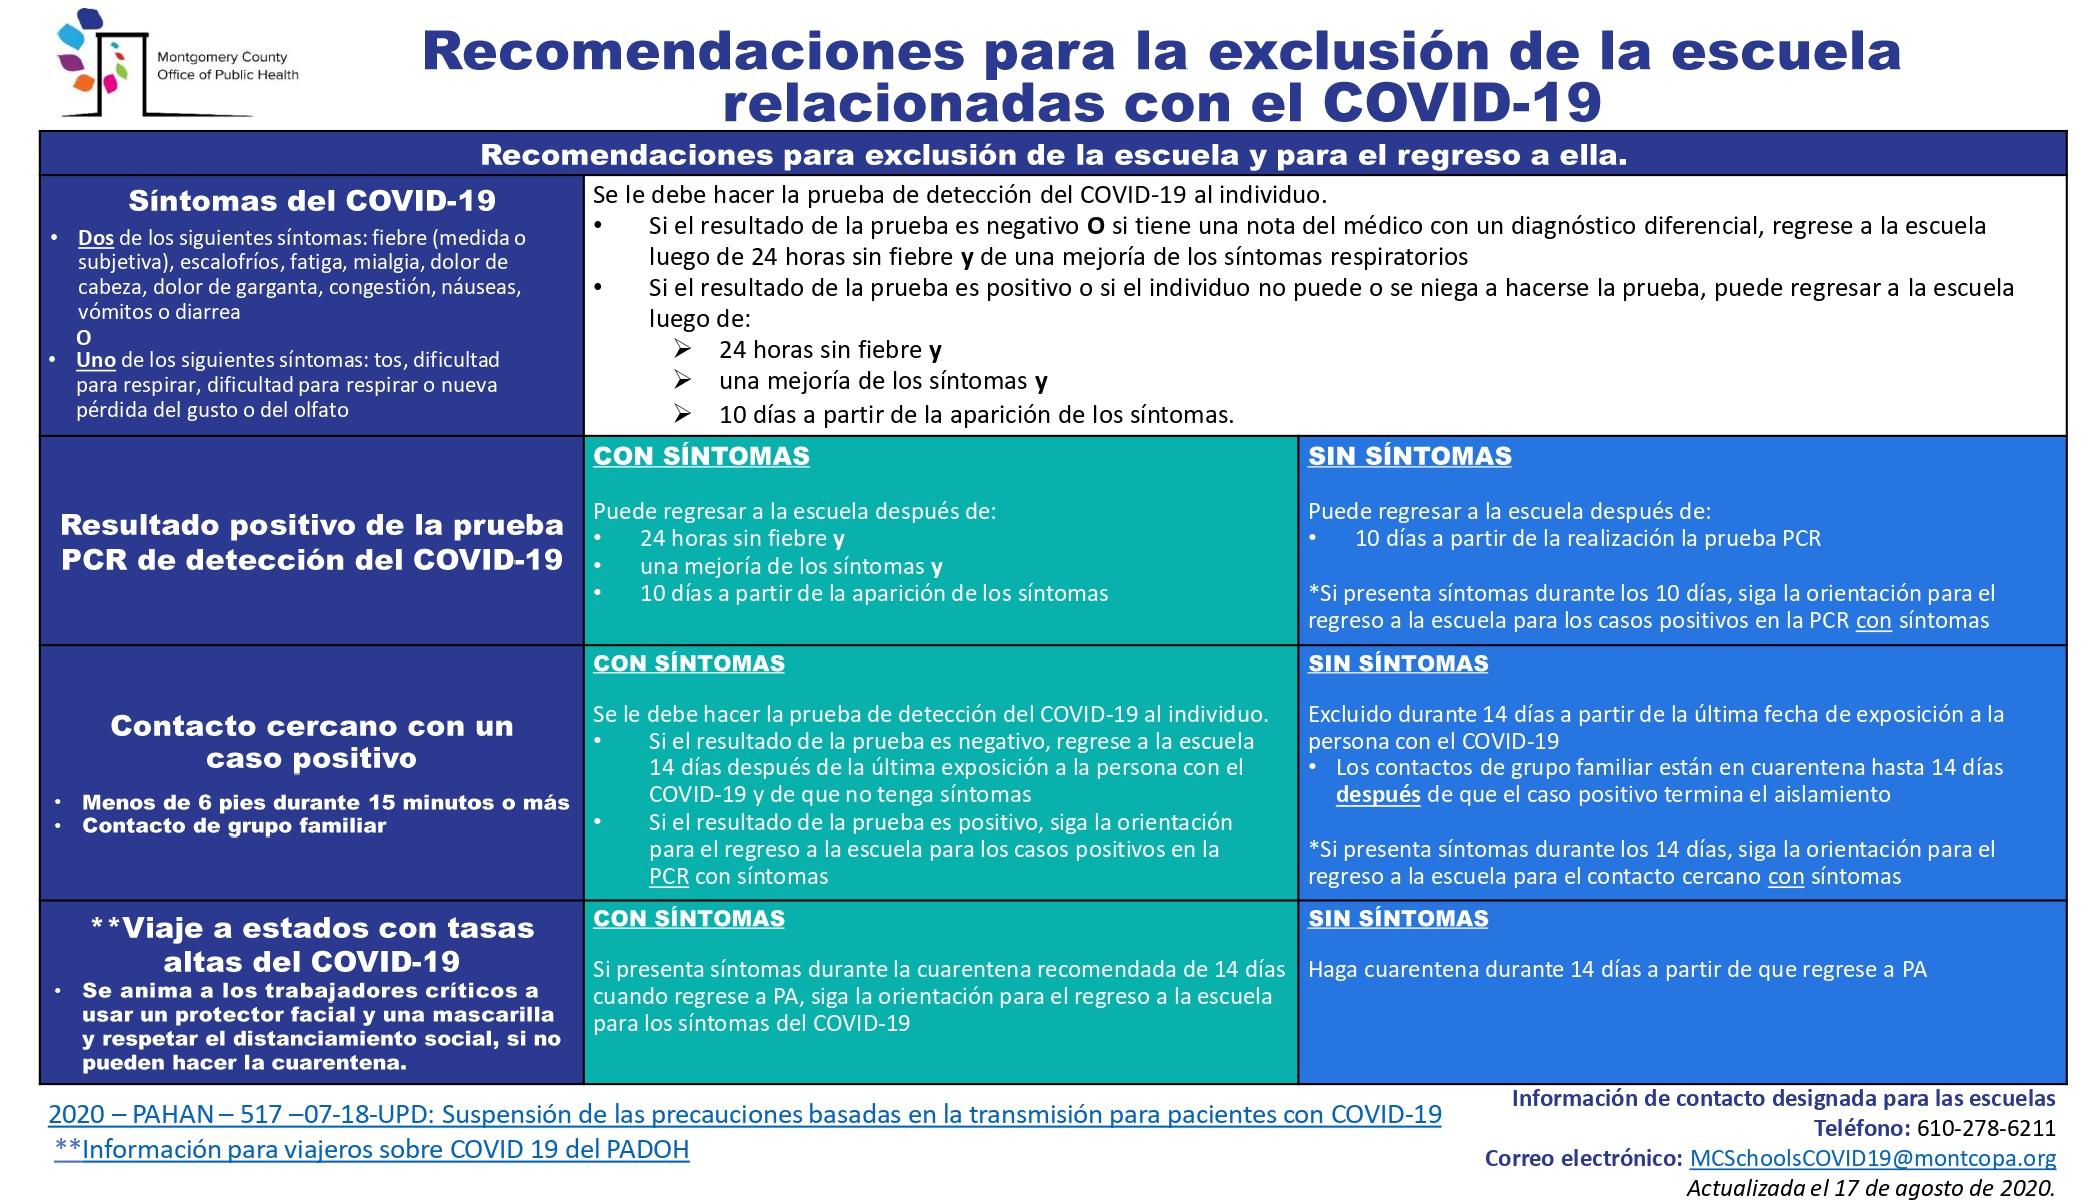 COVID-19 School Exclusion Guide - Dec 2020 SPANISH